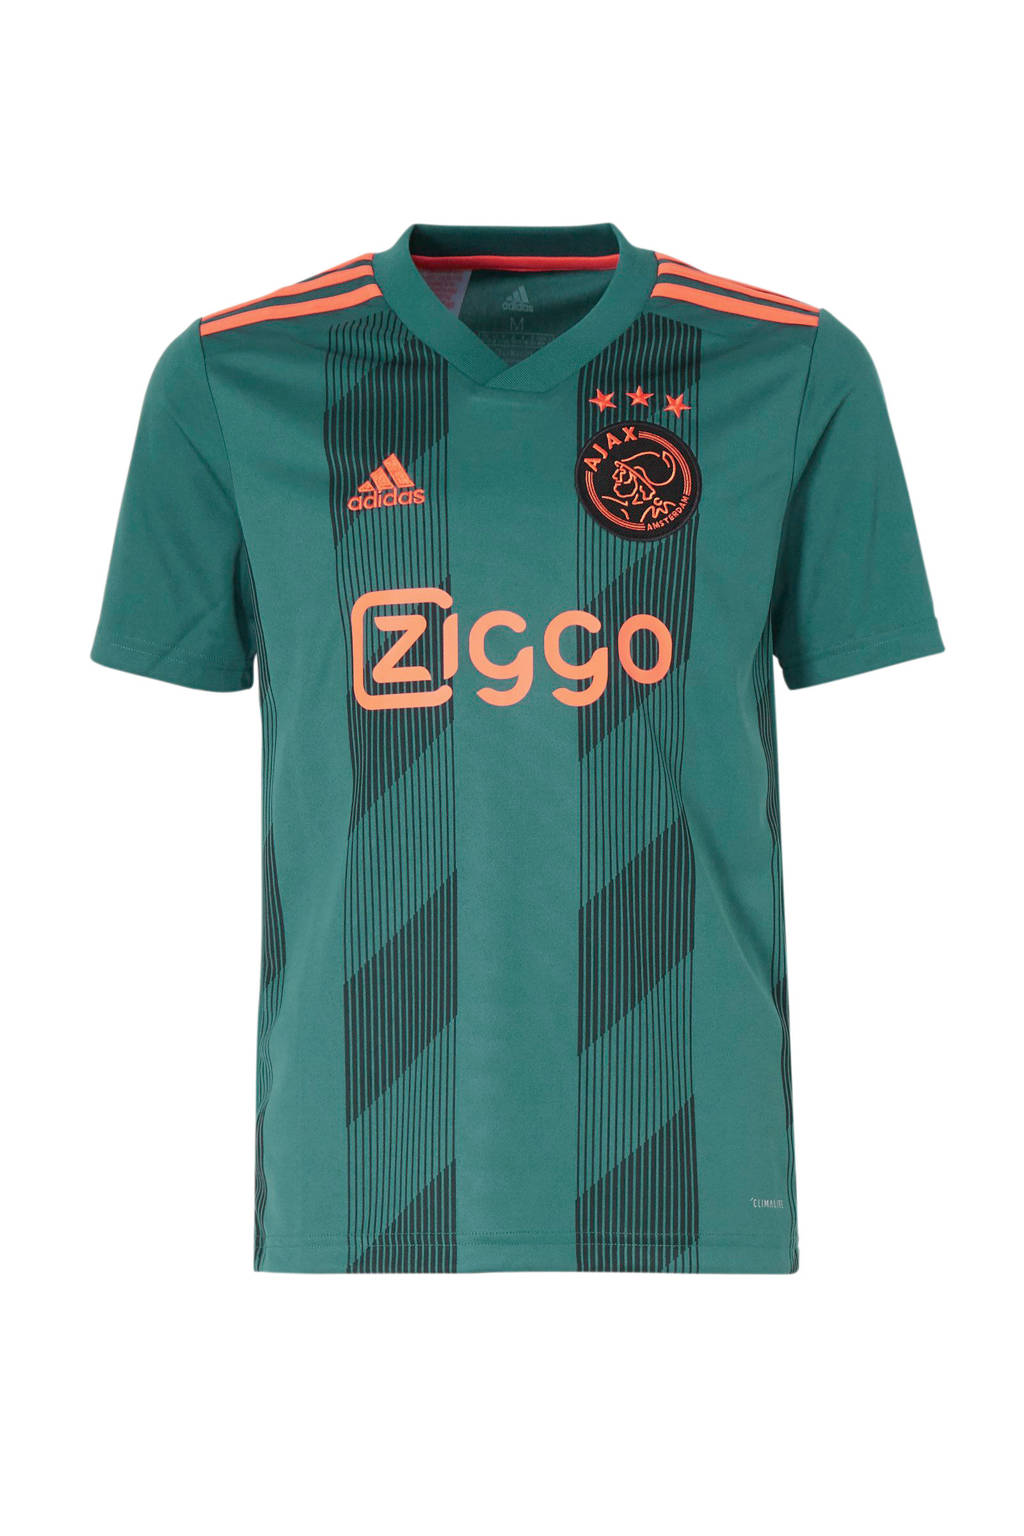 adidas Junior Ajax voetbalshirt Uit, Groen/zwart/oranje